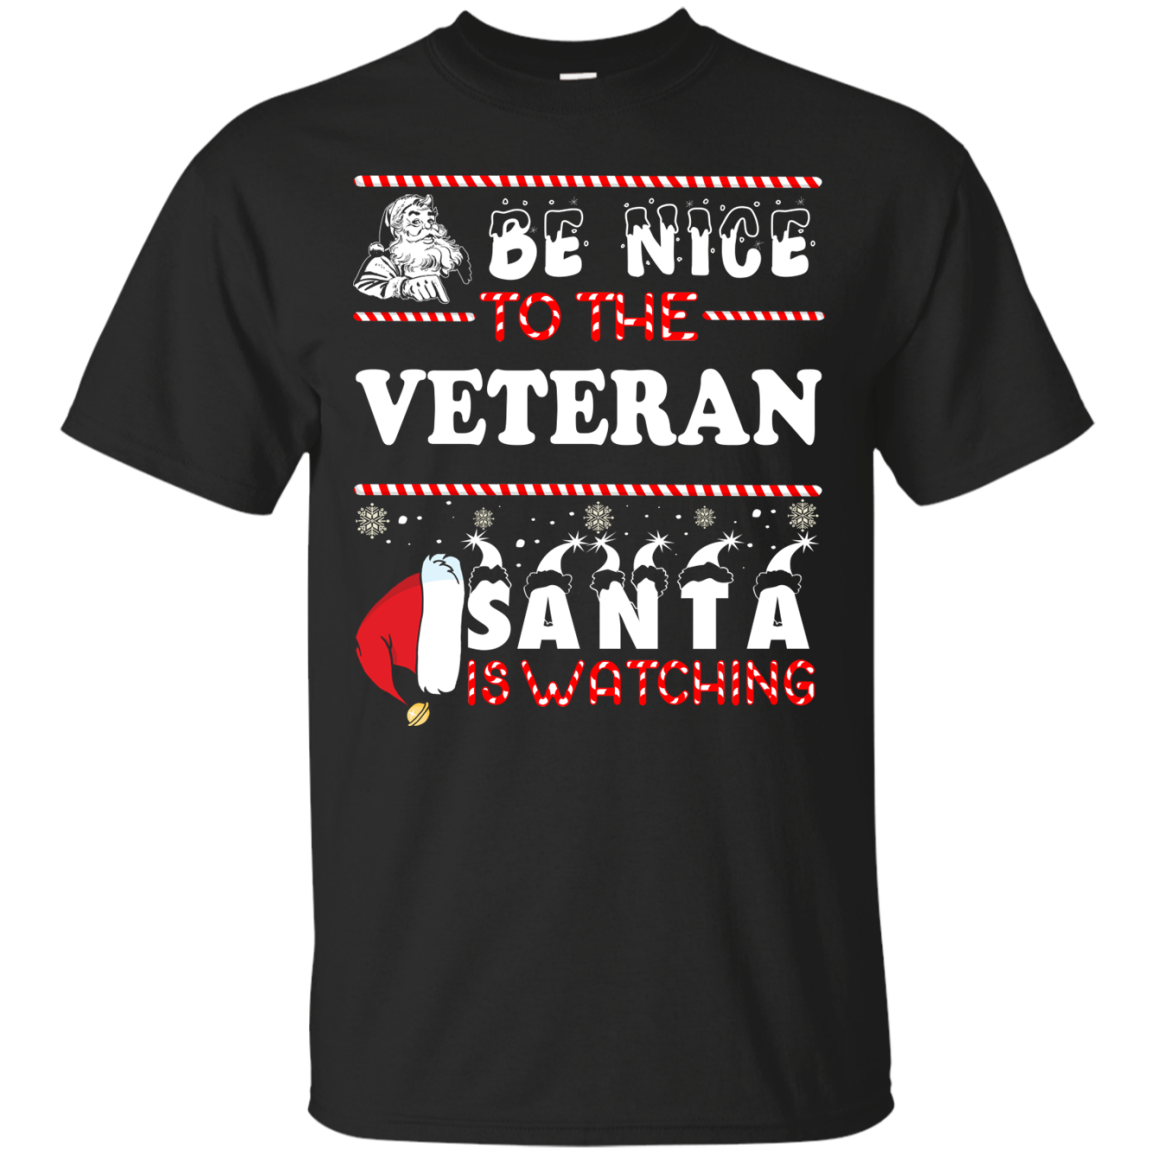 Be Nice To The Veteran Santa Is Watching Sweatshirt, T-Shirt